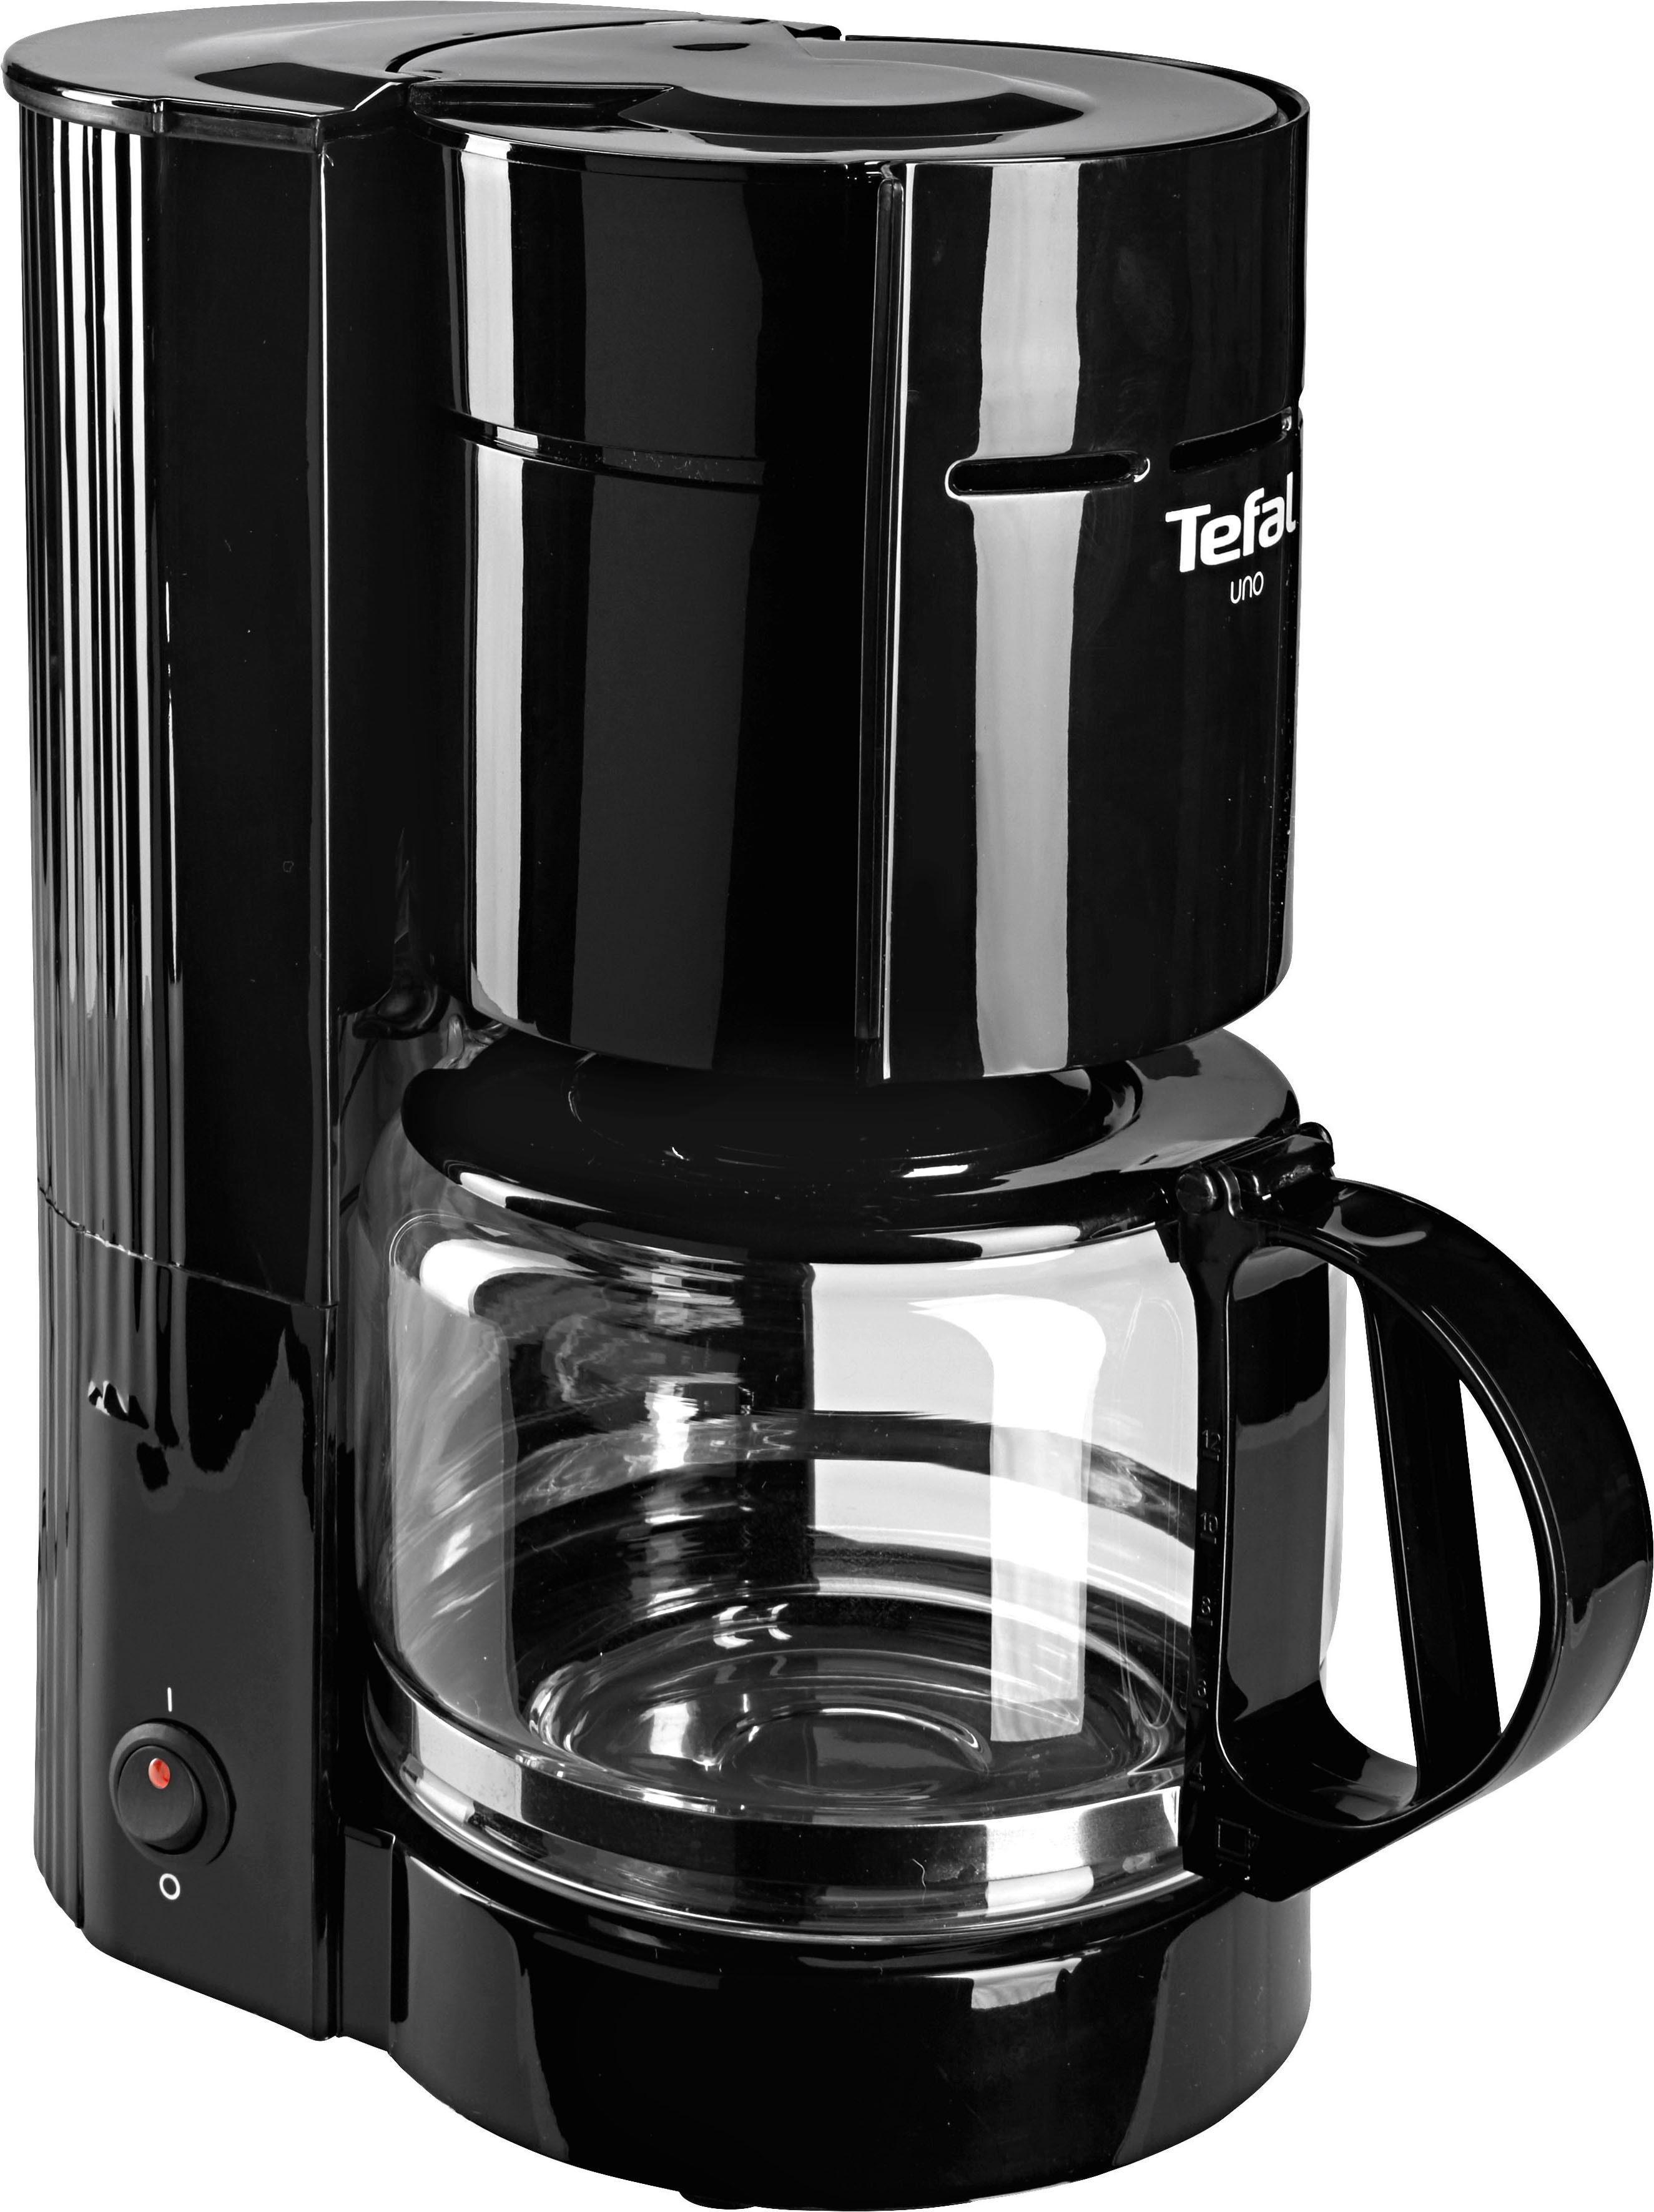 Tefal Filterkaffeemaschine CM1218 UNO, 1,1l Kaffeekanne, Papierfilter